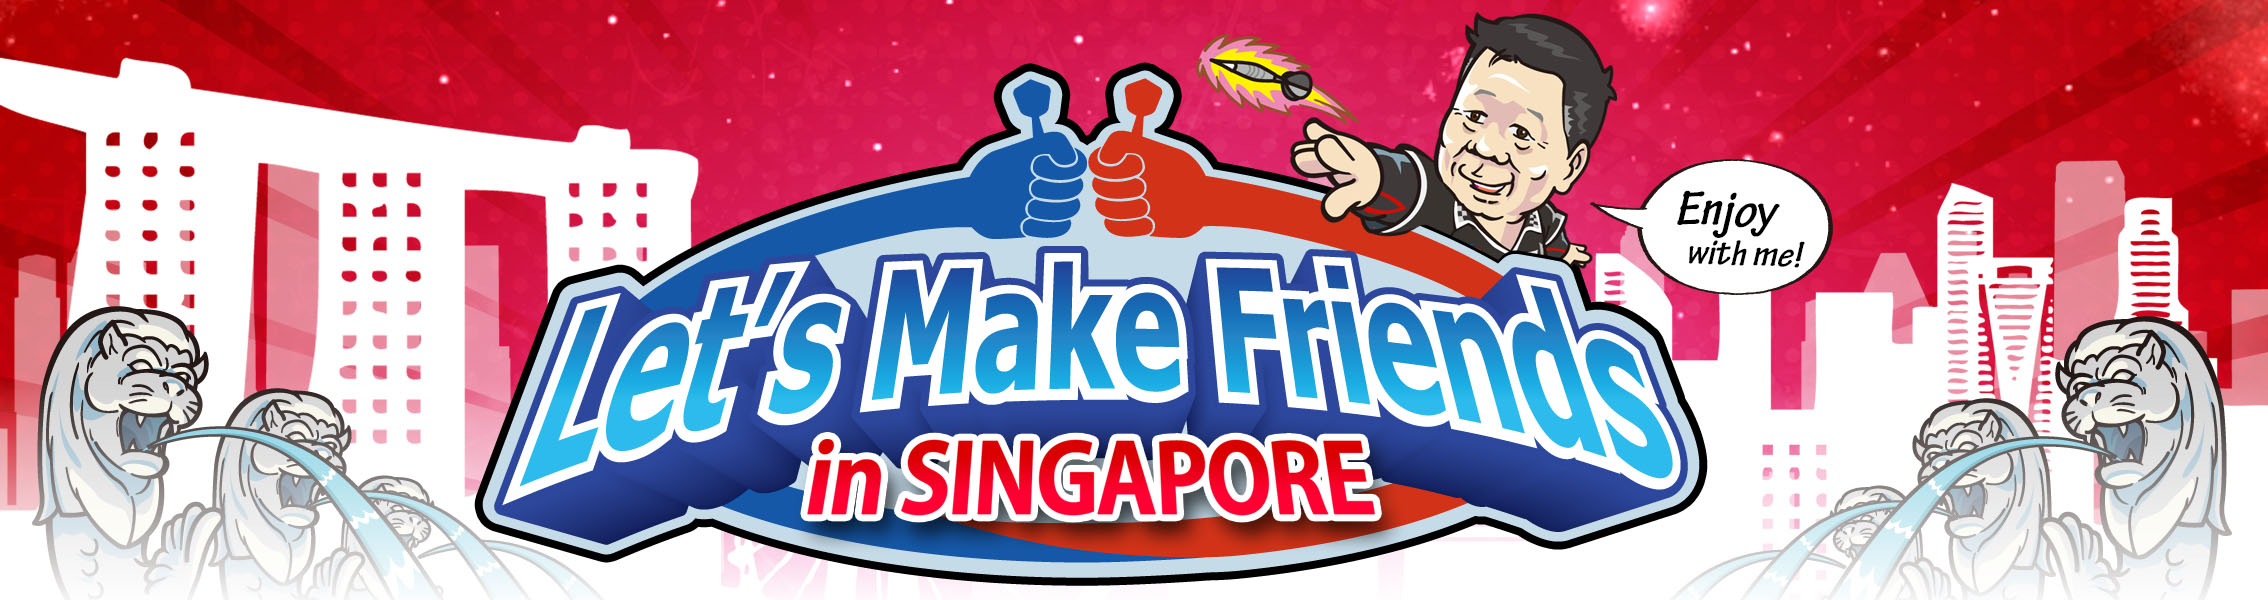 Celebrating SG50 by Lets Make Friends!